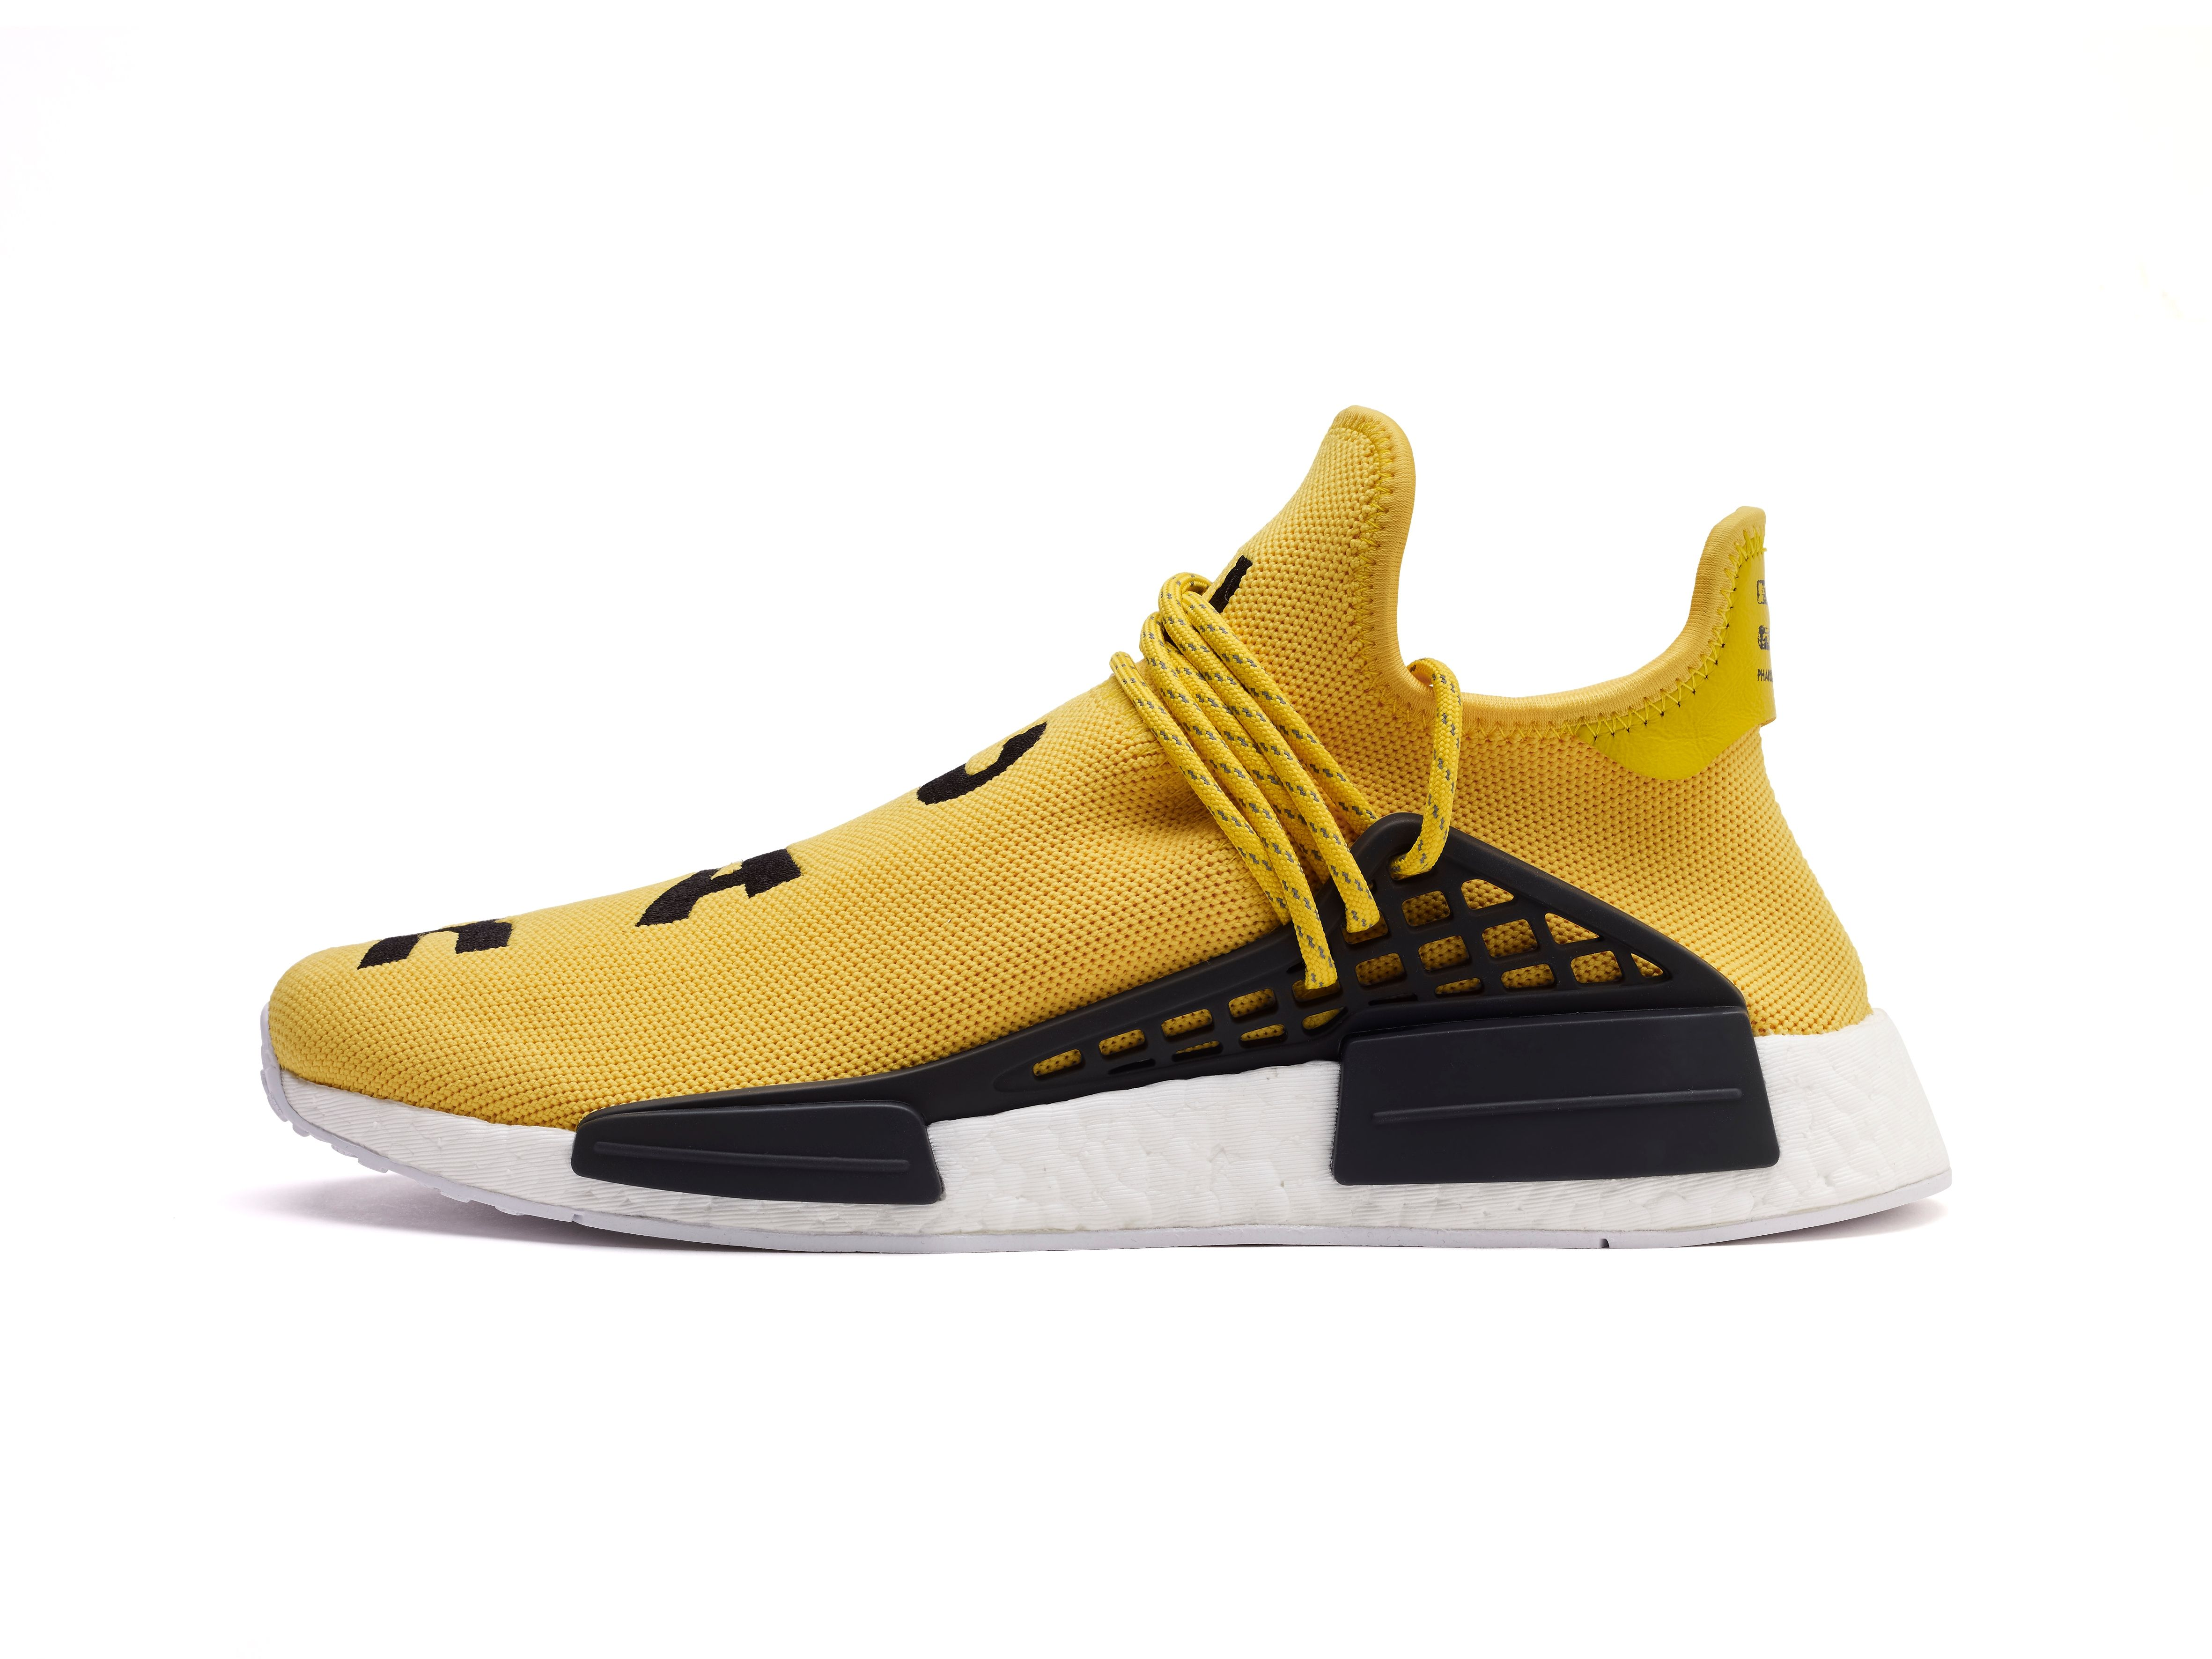 wholesale dealer 605e6 21d87 Adidas Originals